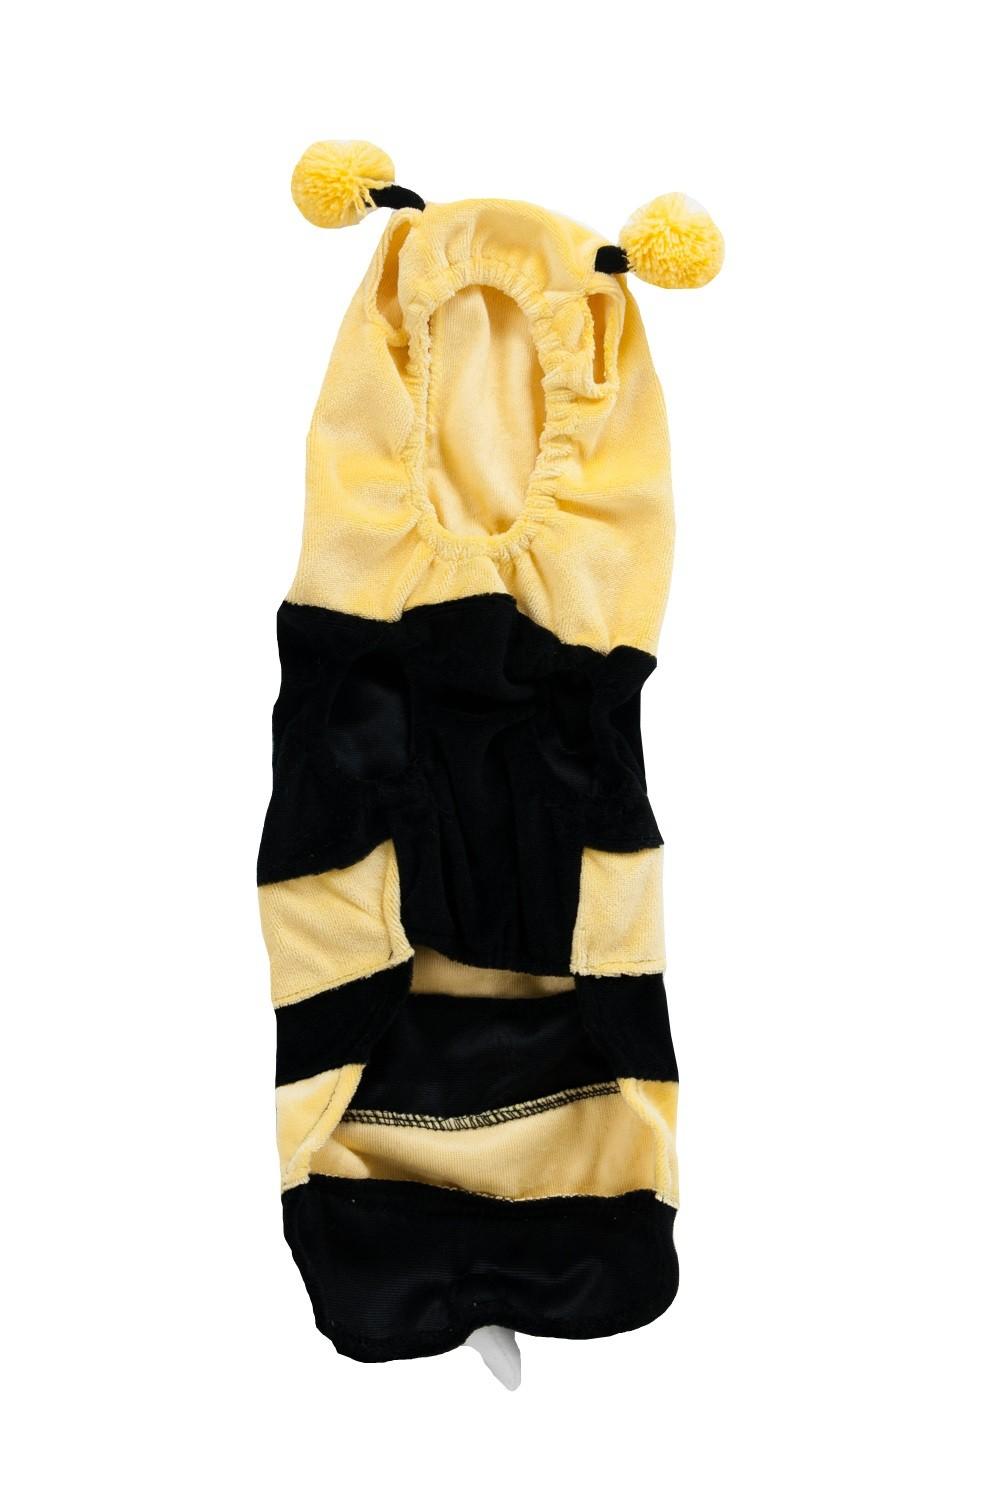 karneval kost m f r hunde hundekost m fasching mops verkleidung tier kleidung ebay. Black Bedroom Furniture Sets. Home Design Ideas